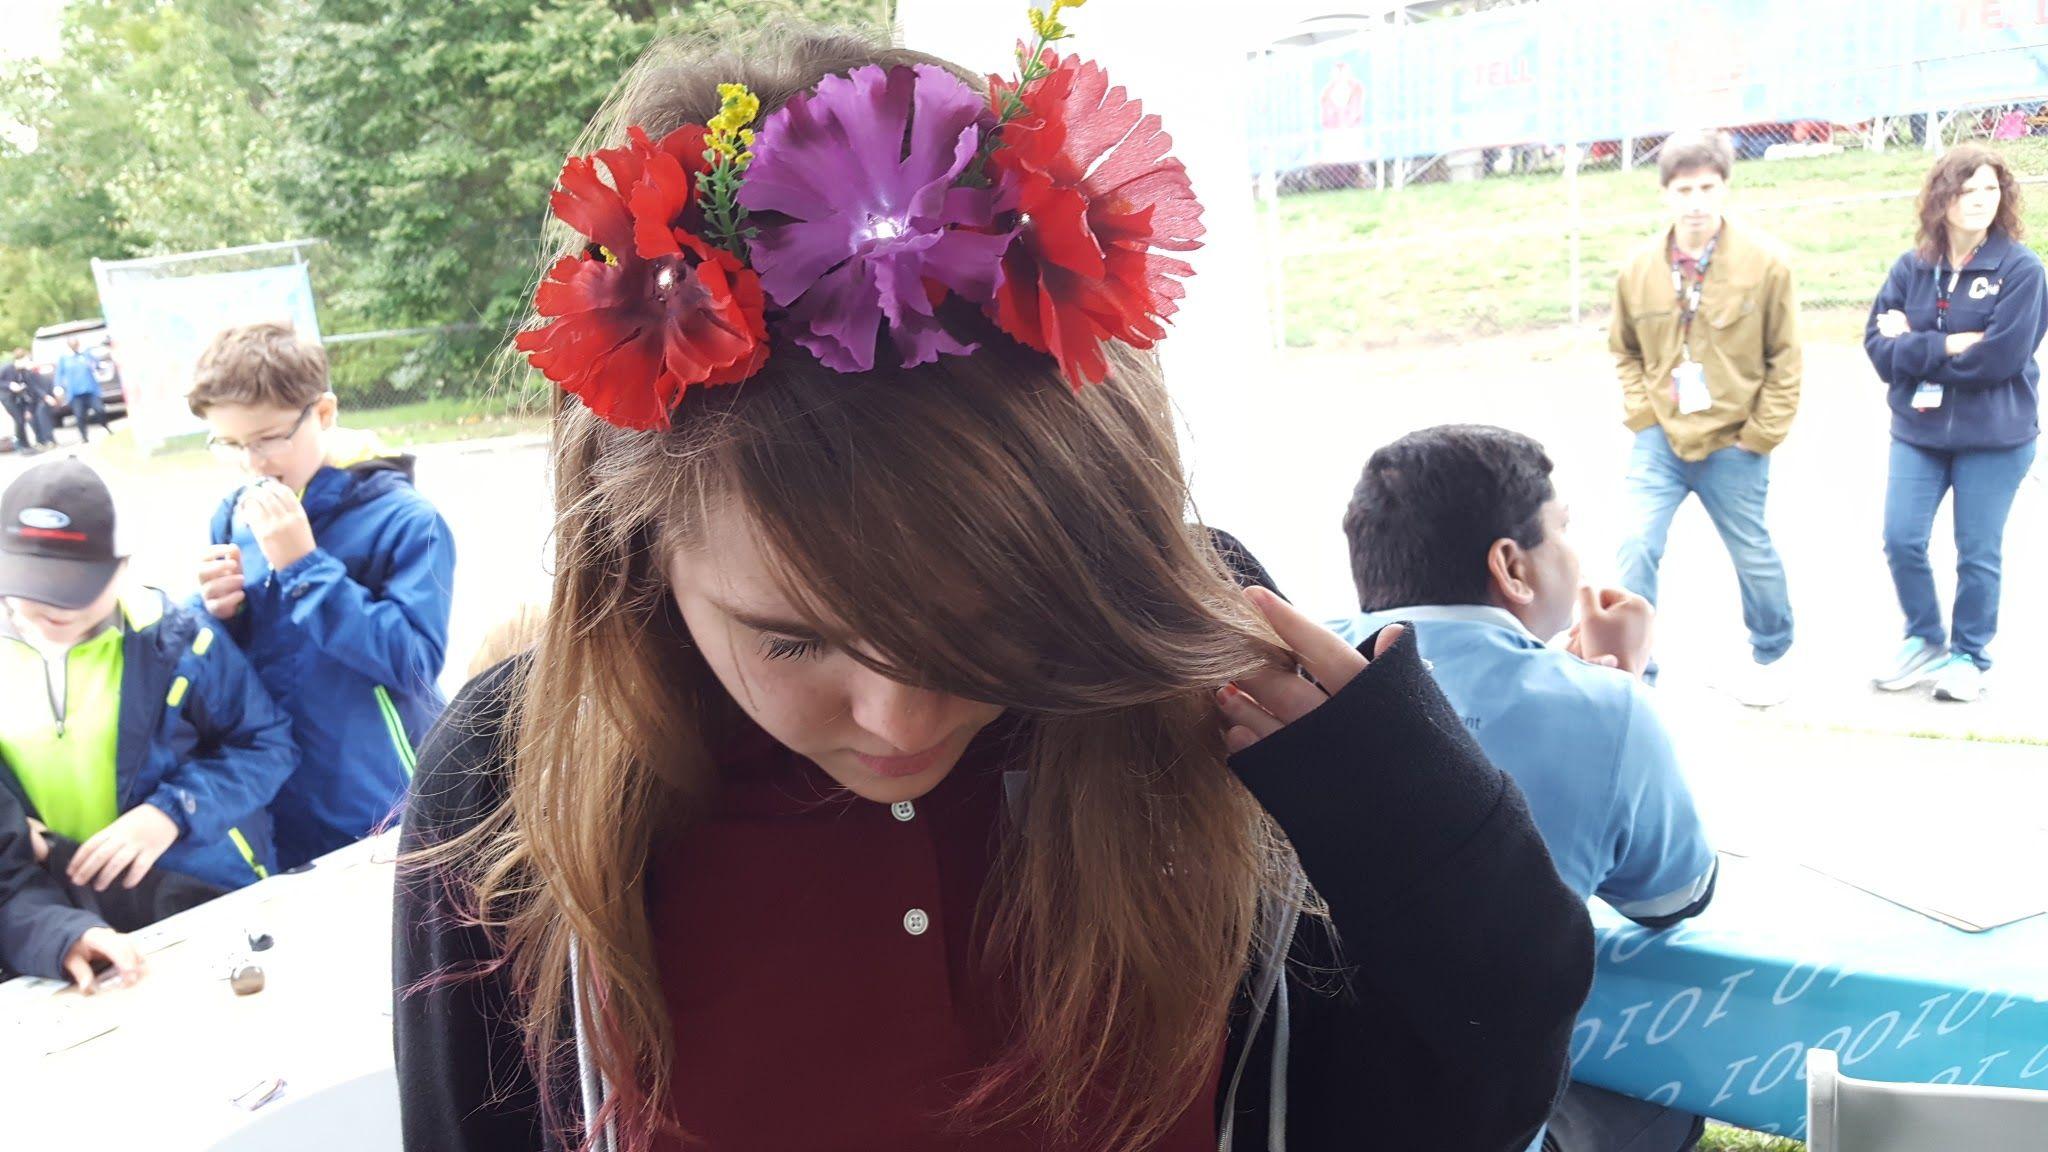 Frida Kahlo Flower Crown Chibitronics Stick On Led Lights